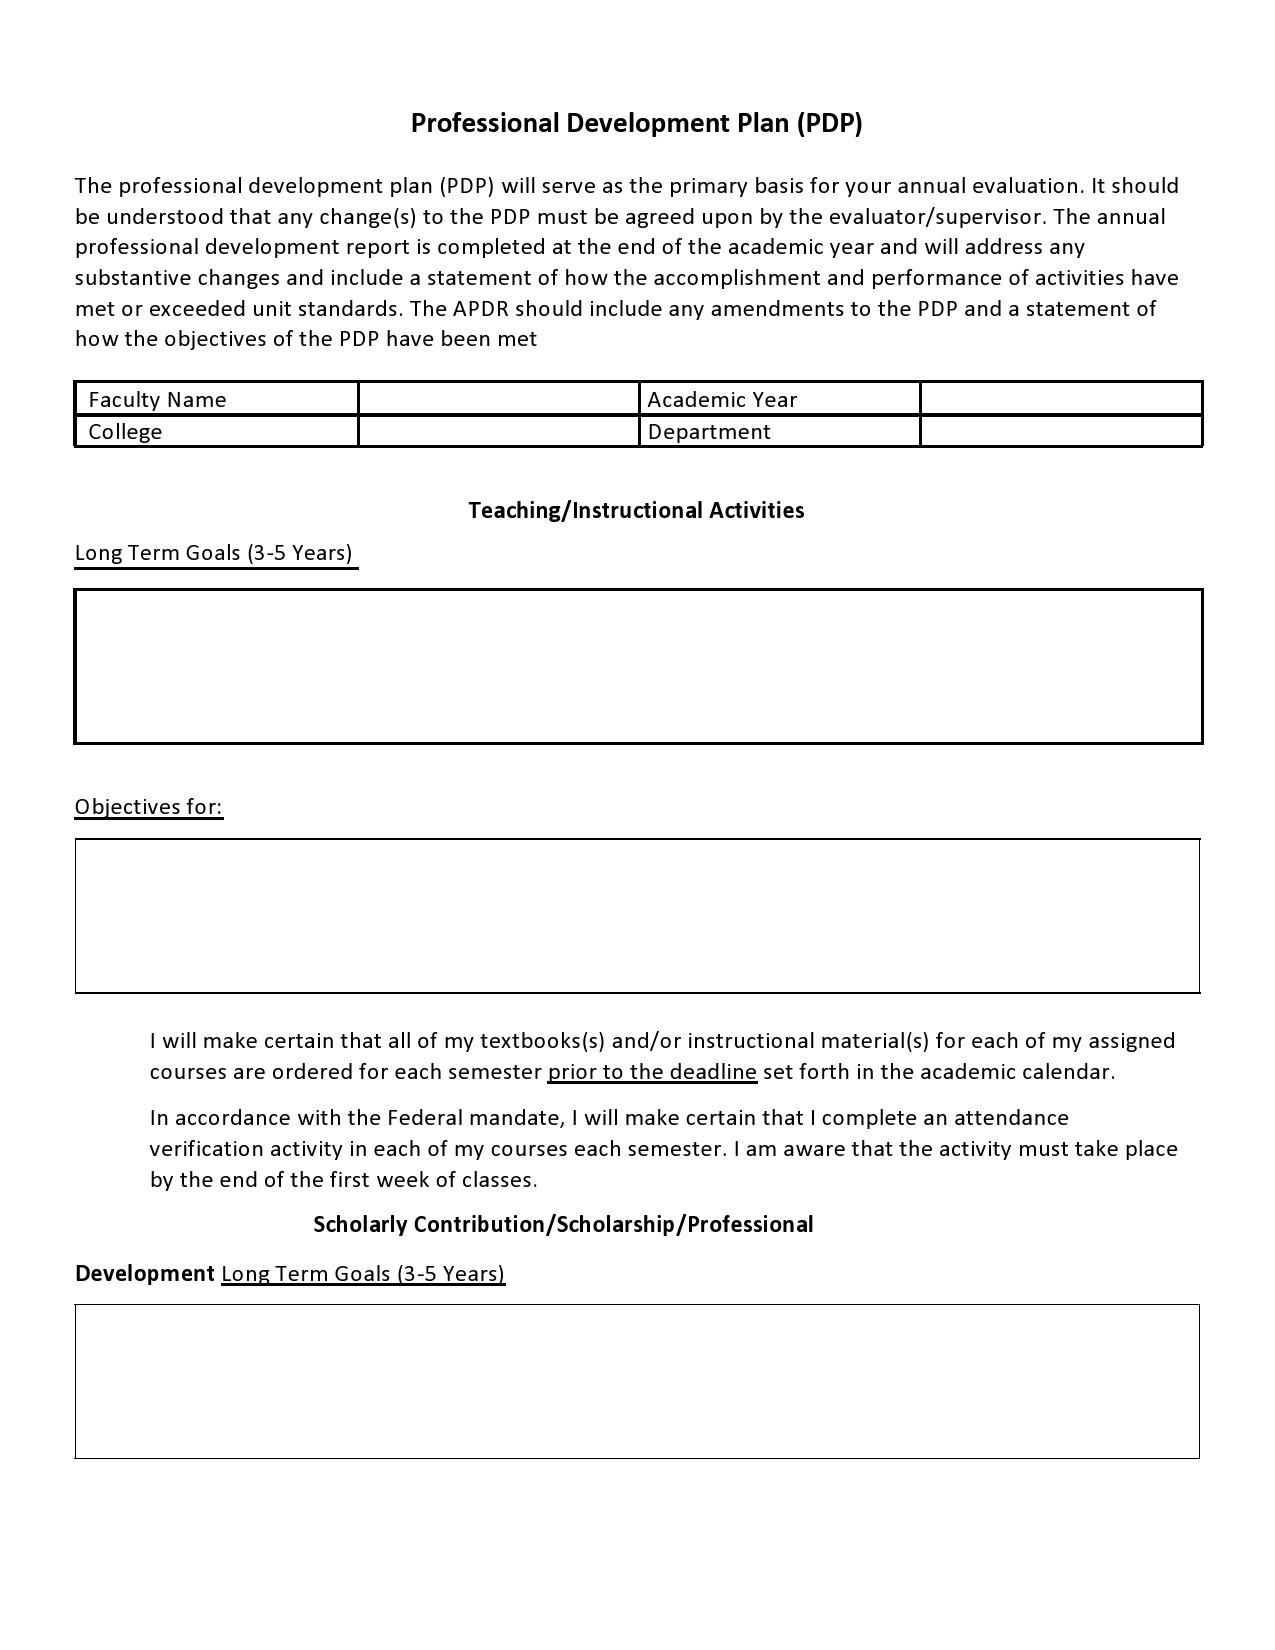 Free professional development plan 03